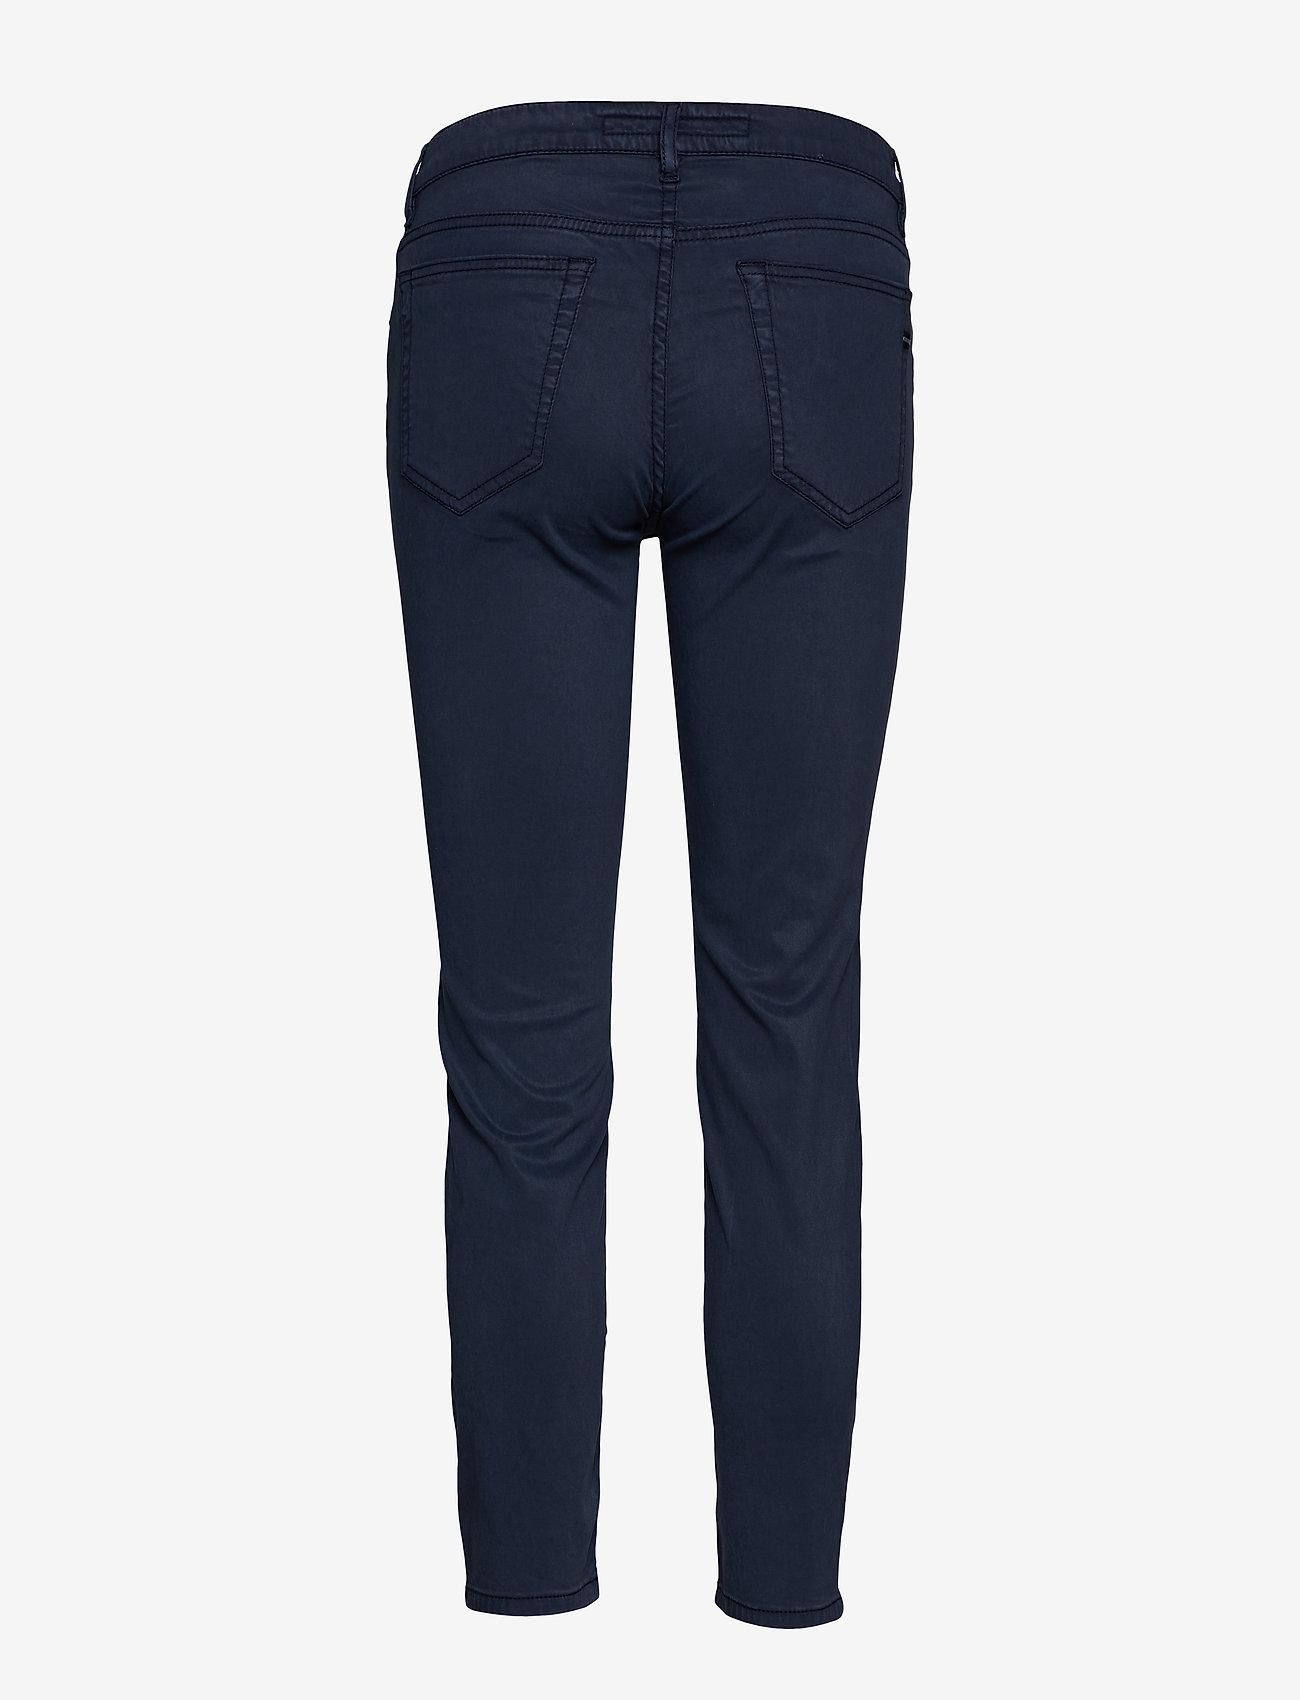 Marc O'Polo - Jeans - skinny jeans - deep atlantic - 3